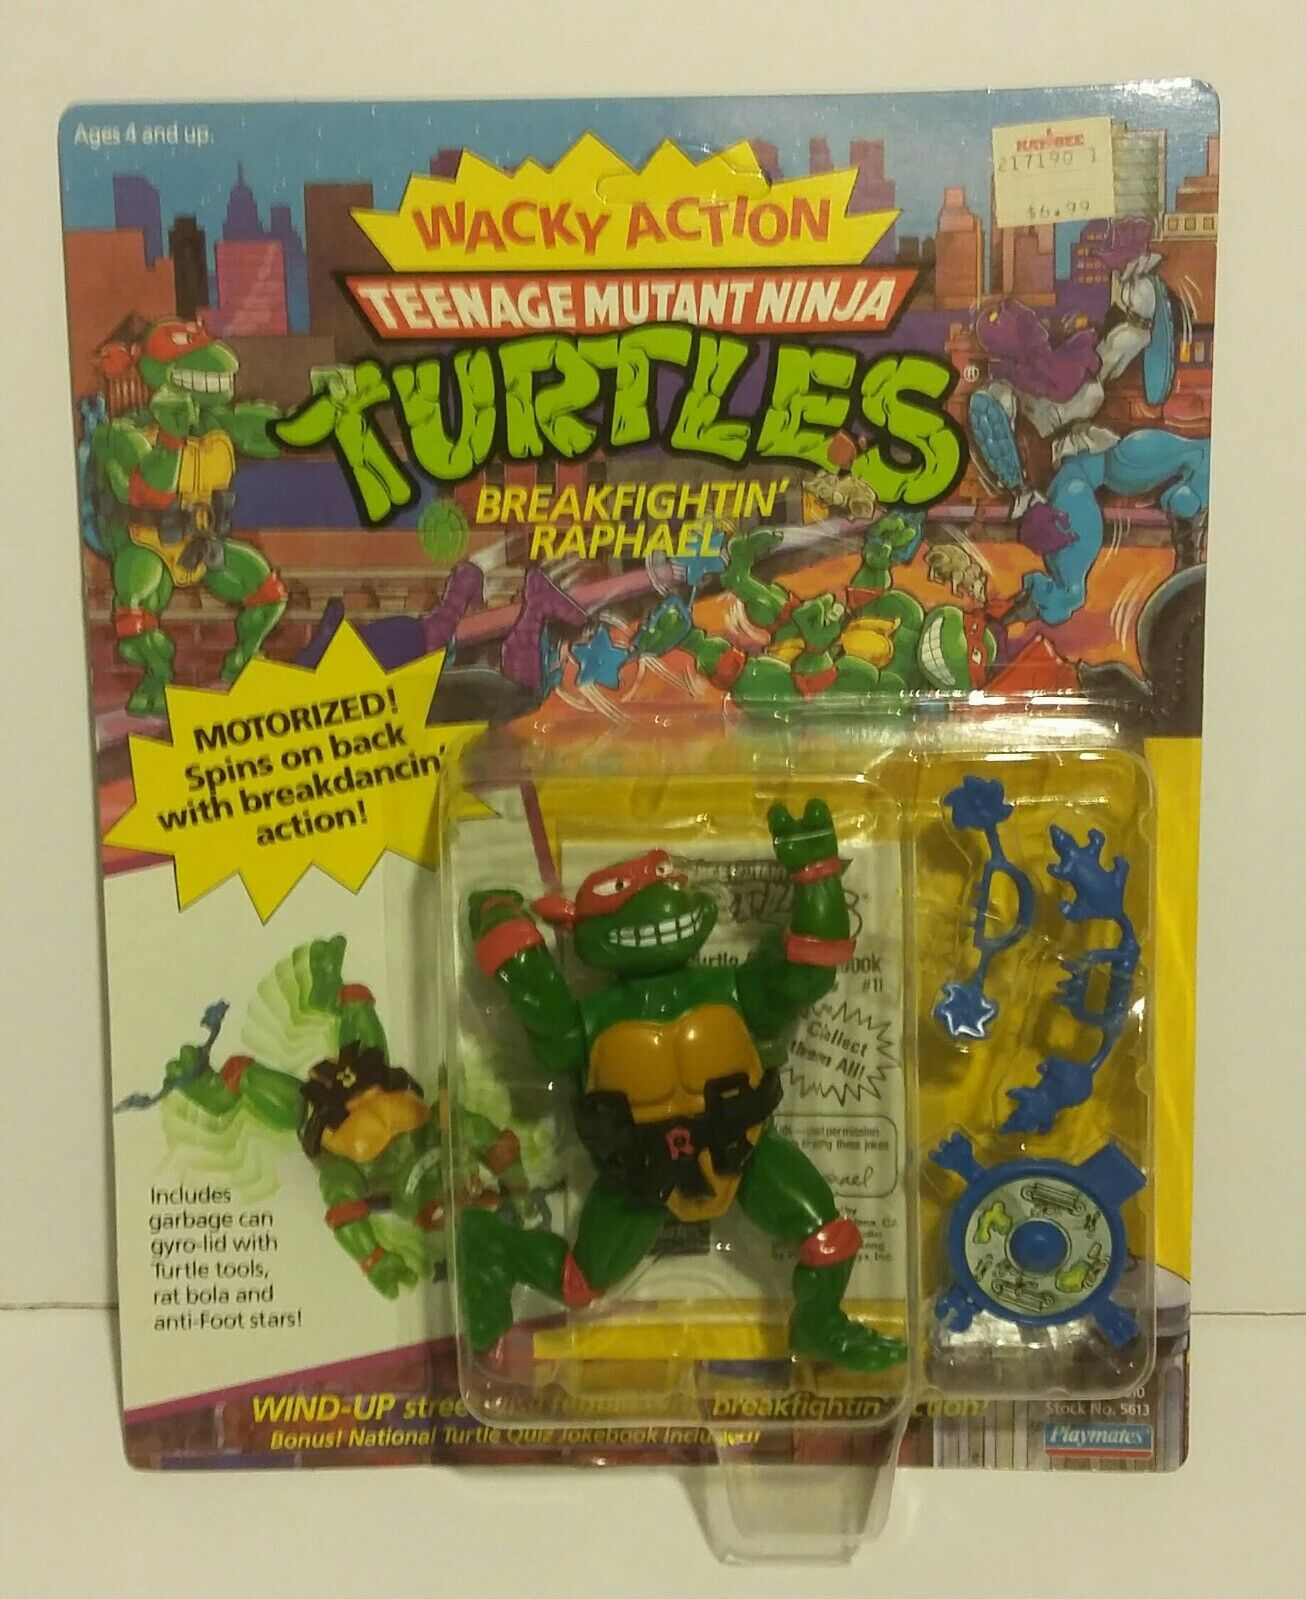 mas preferencial Teenage Mutant Ninja Ninja Ninja Turtles Wacky figuras de acción Raph Don Mike Leo Tortugas Ninja 2018 Playmates  nuevo sádico